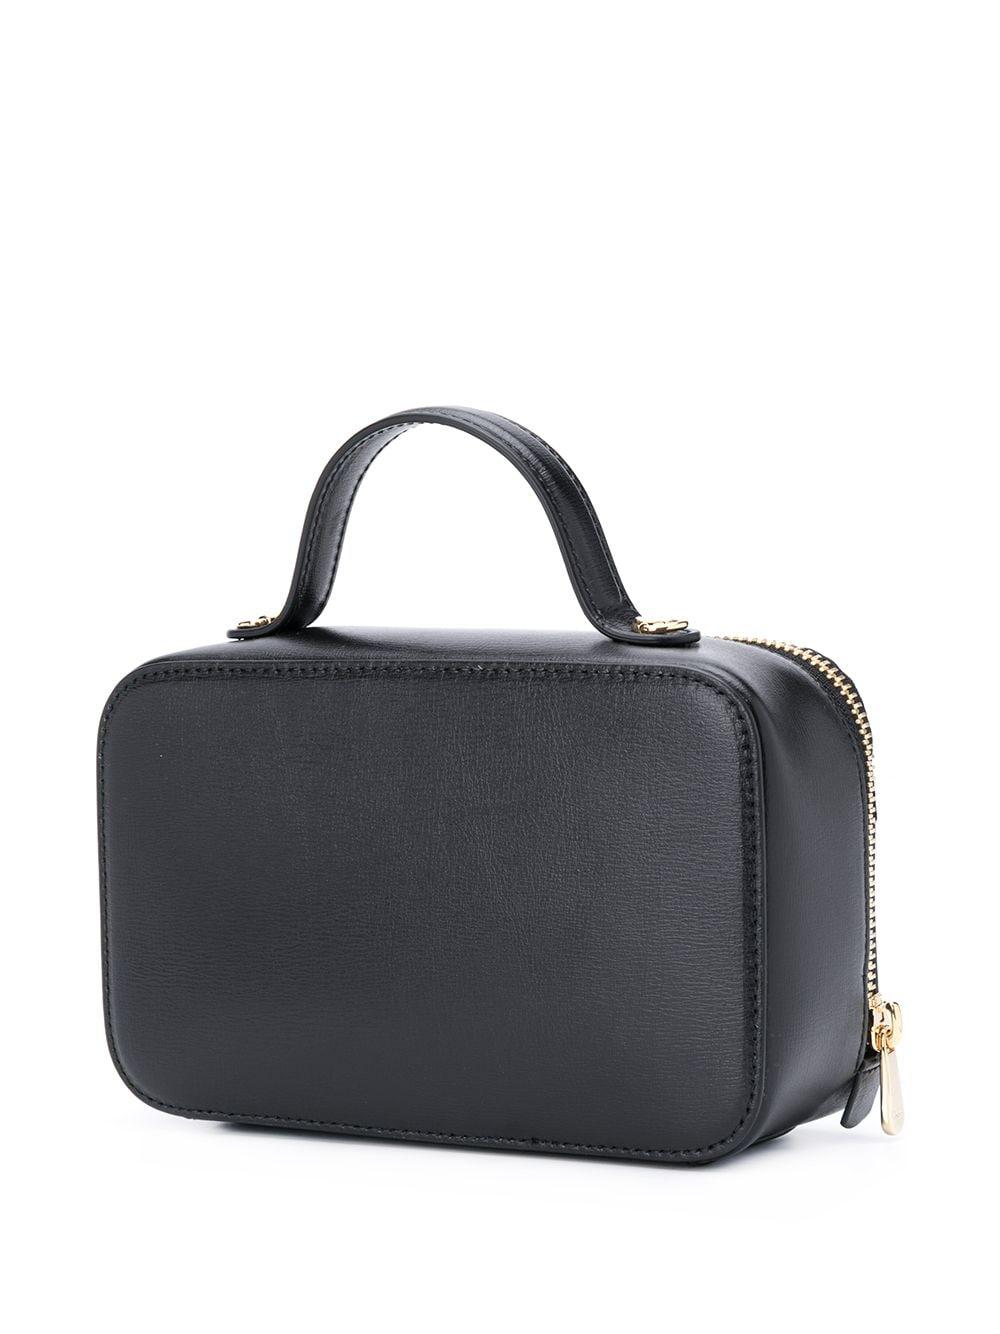 Picture of Ferragamo   Leather Crossbody Bag